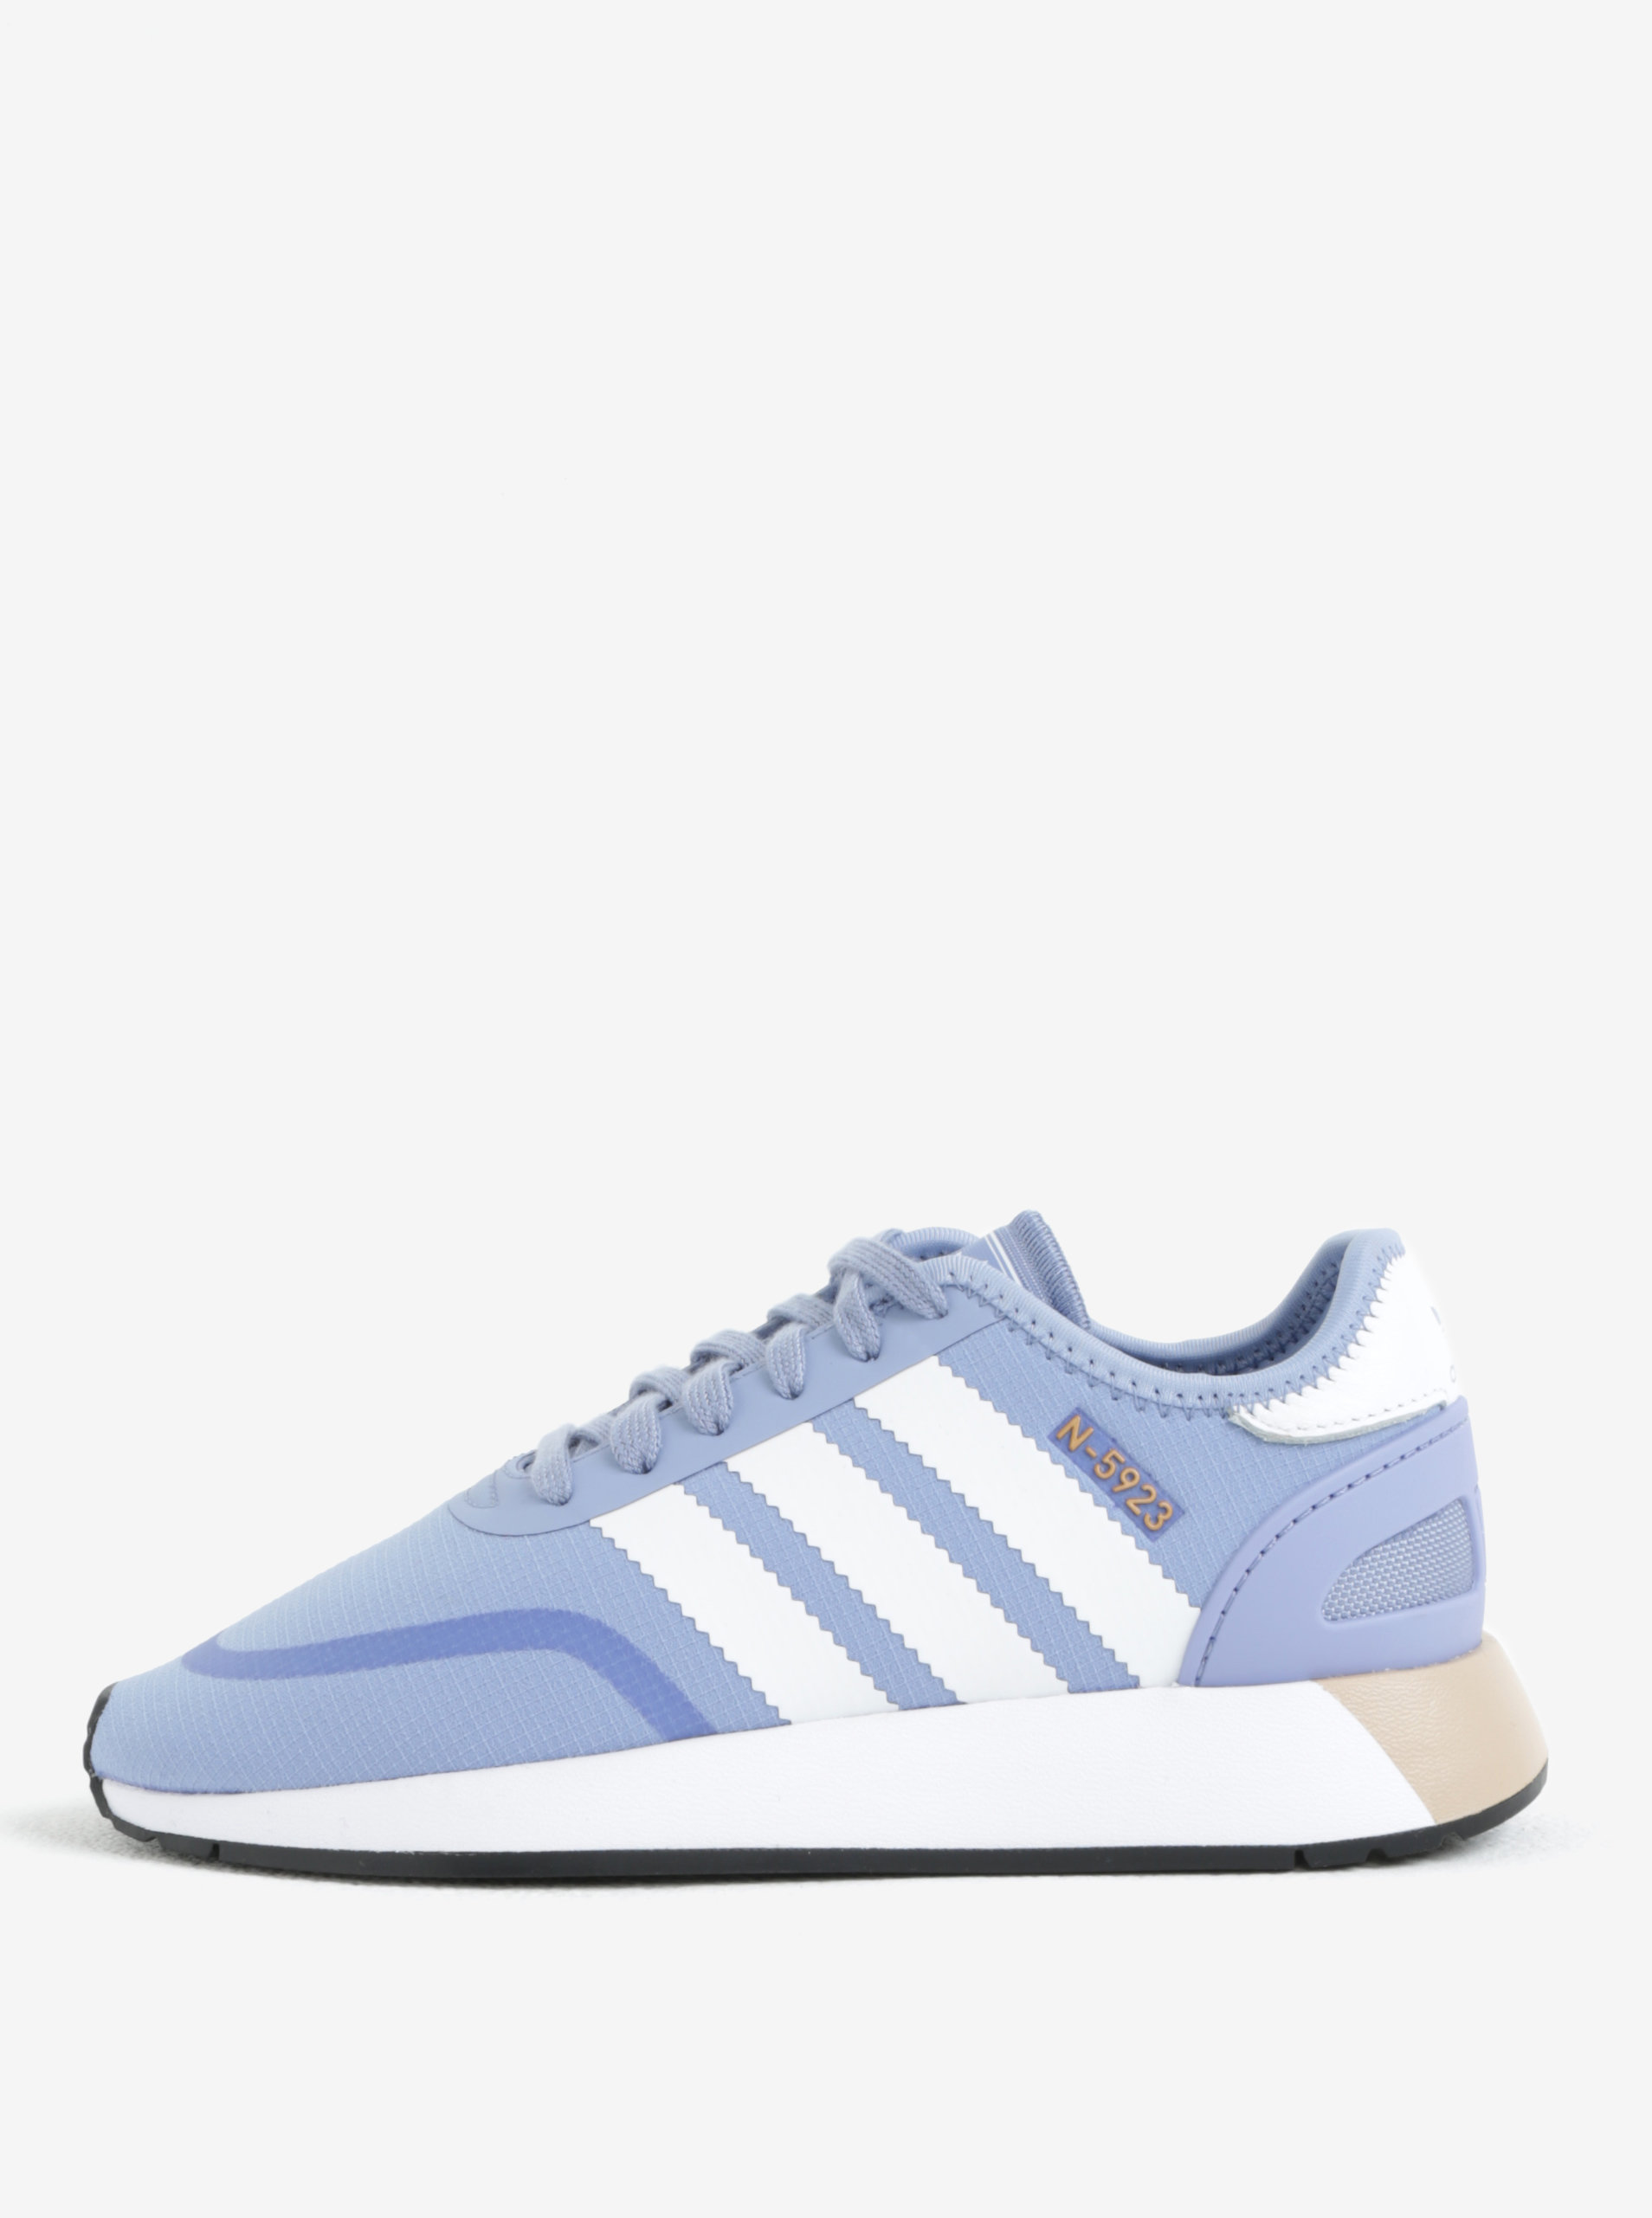 97d8e18bcda99 Modré dámske tenisky adidas Originals Iniki | ZOOT.sk